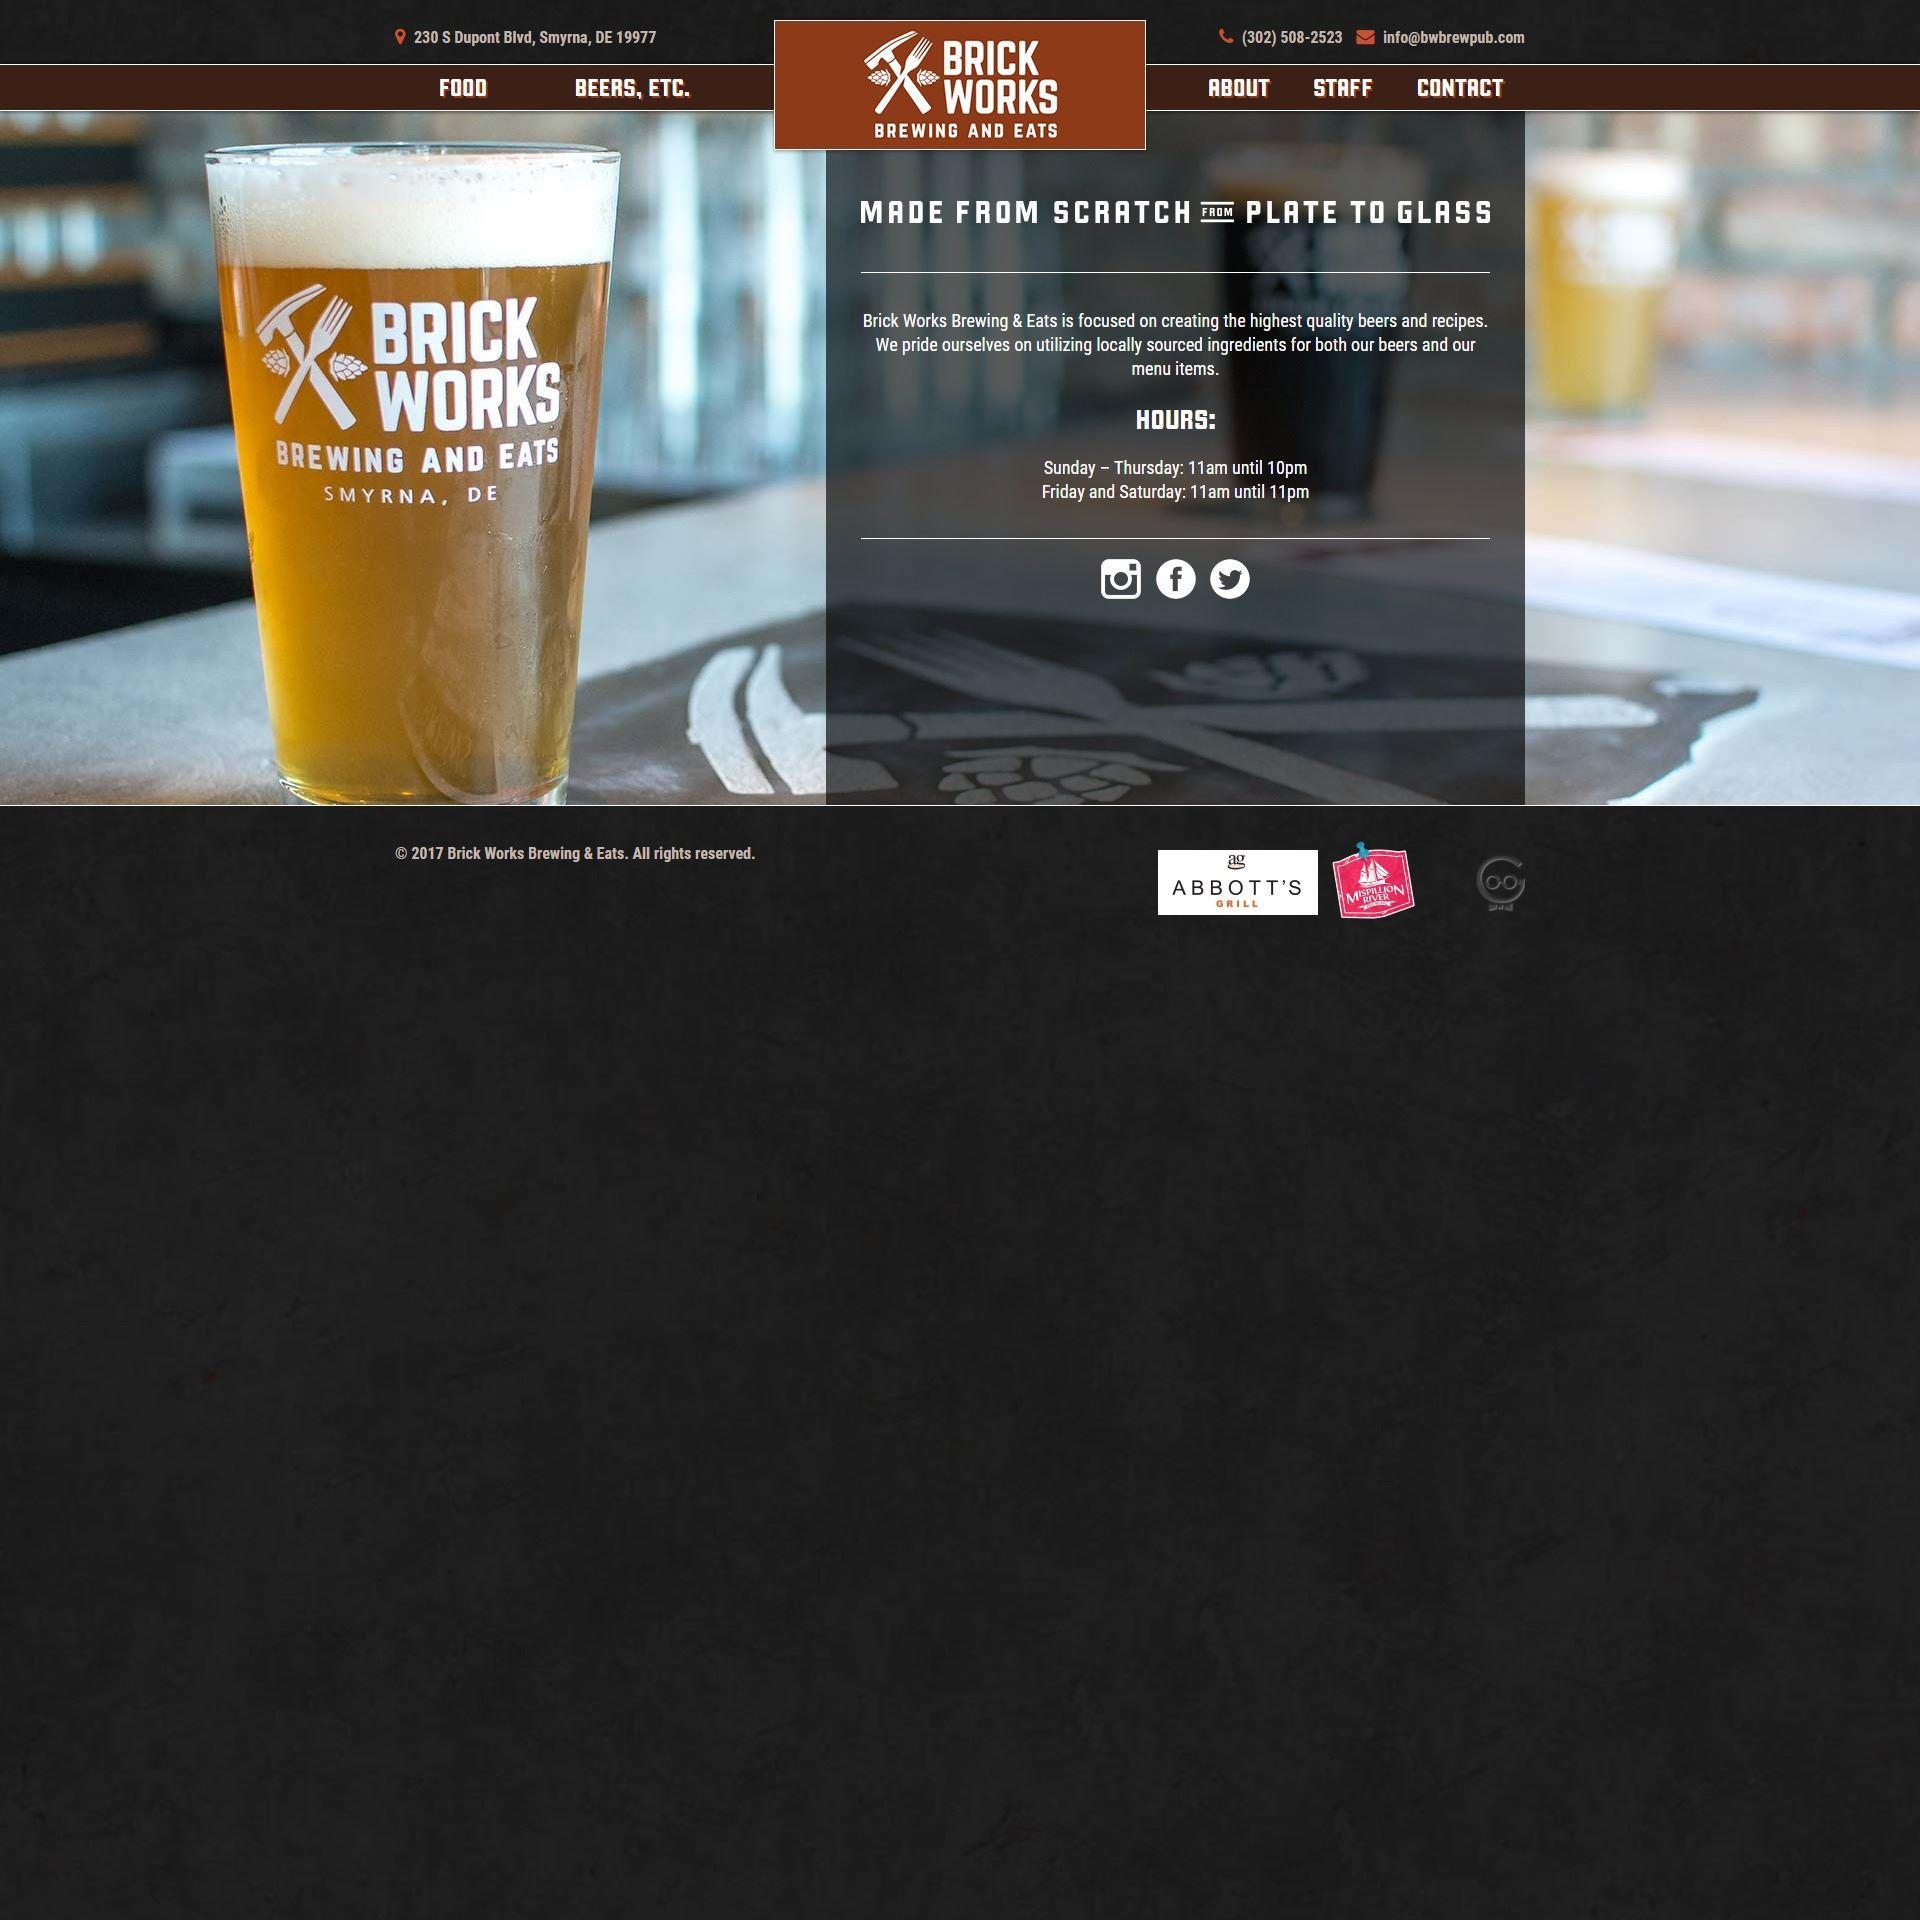 Brick Works website